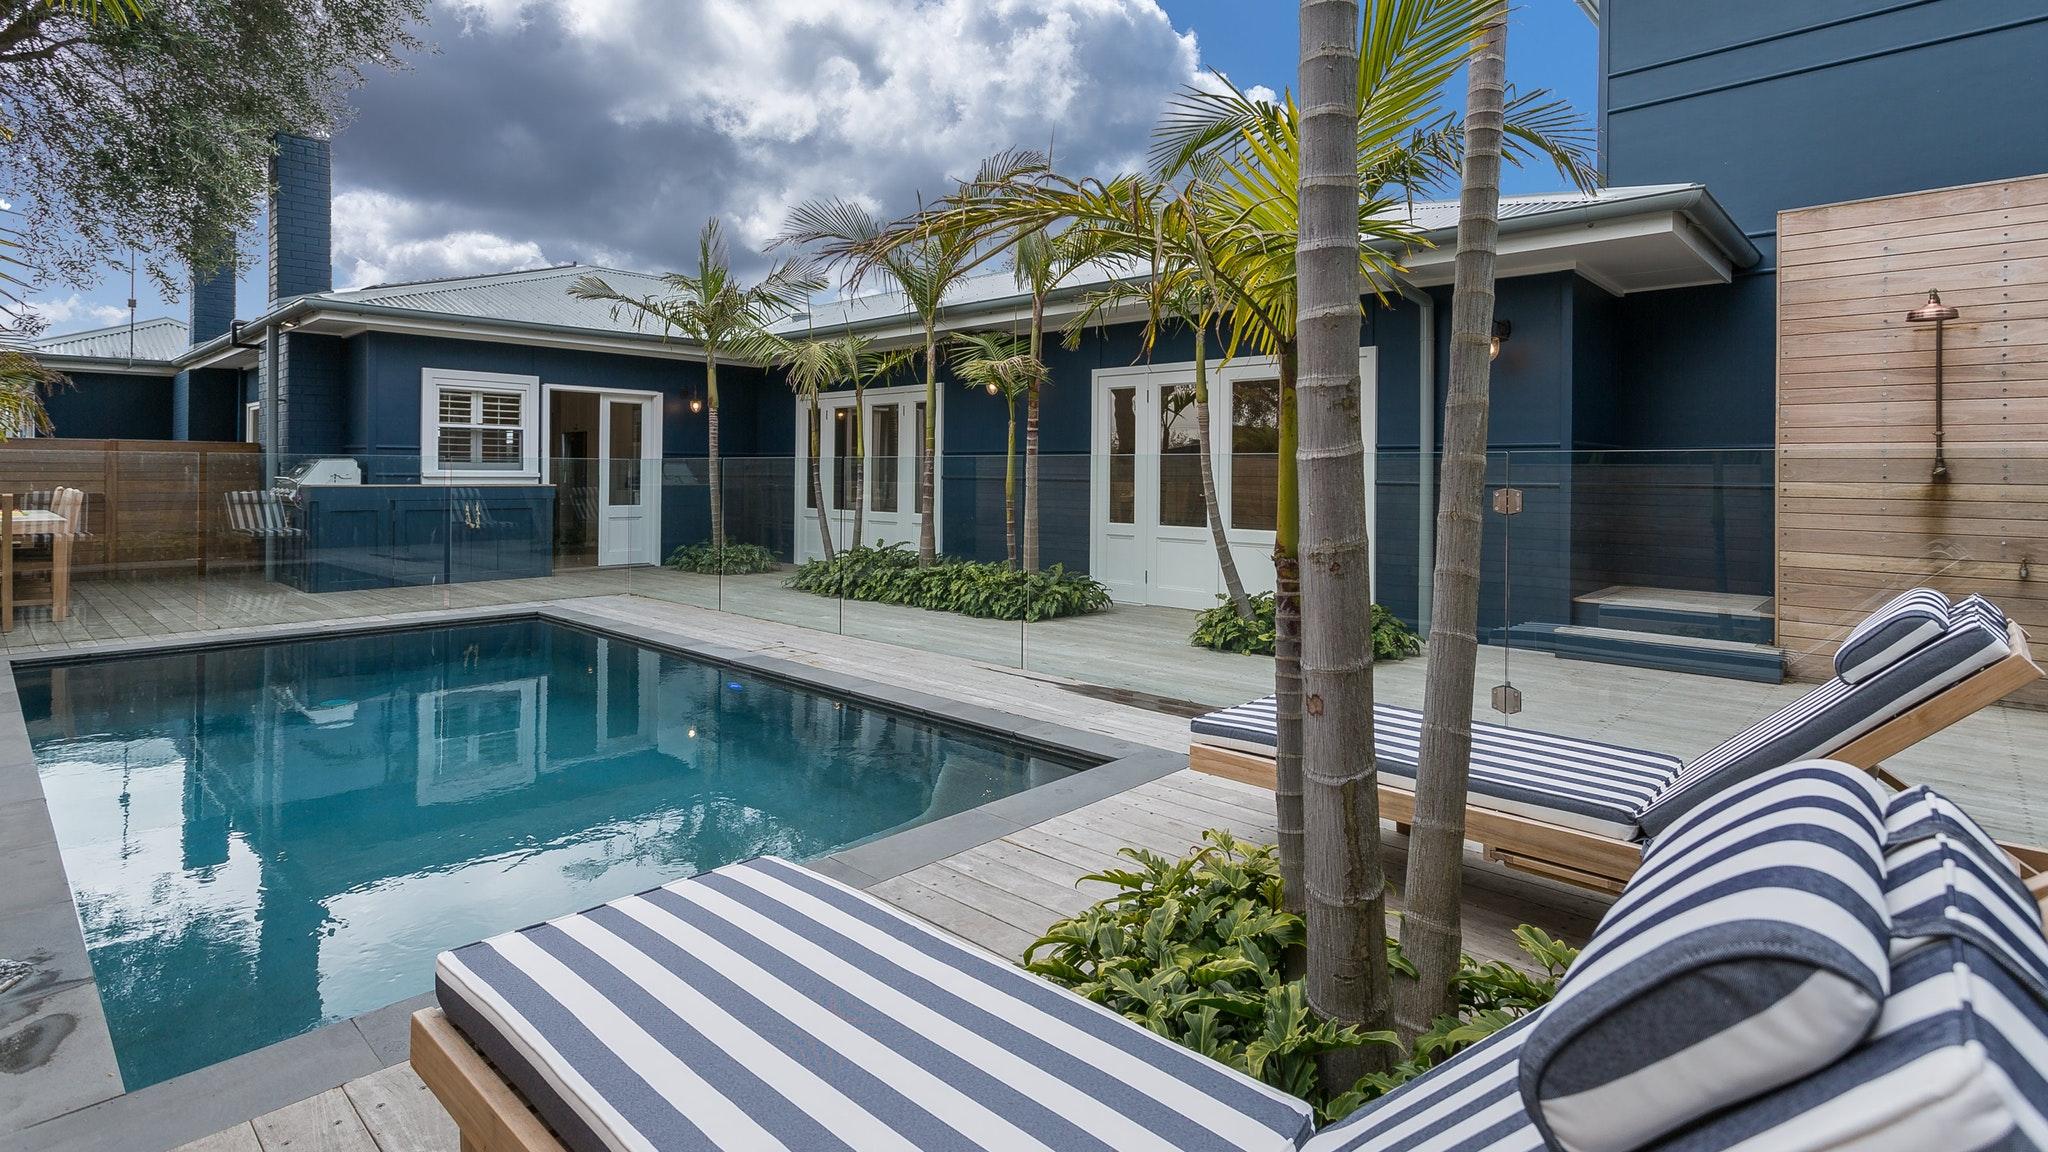 Beach Retreats Holiday Rentals - Allowrie